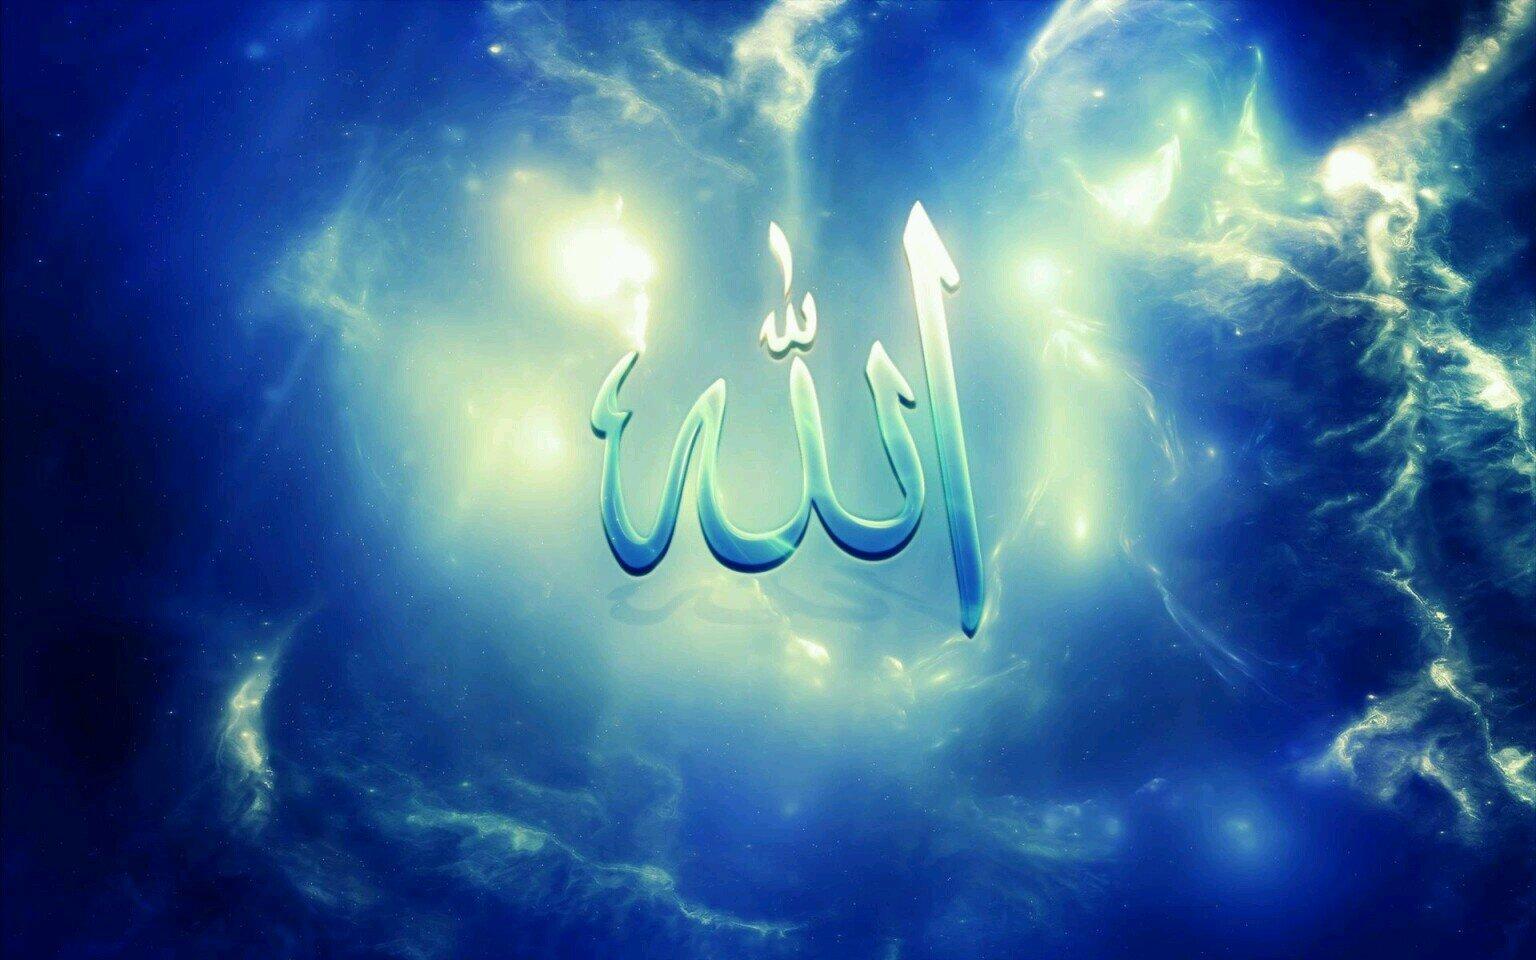 фото аватарке красивые картинки имена аллаха искусственный топиари